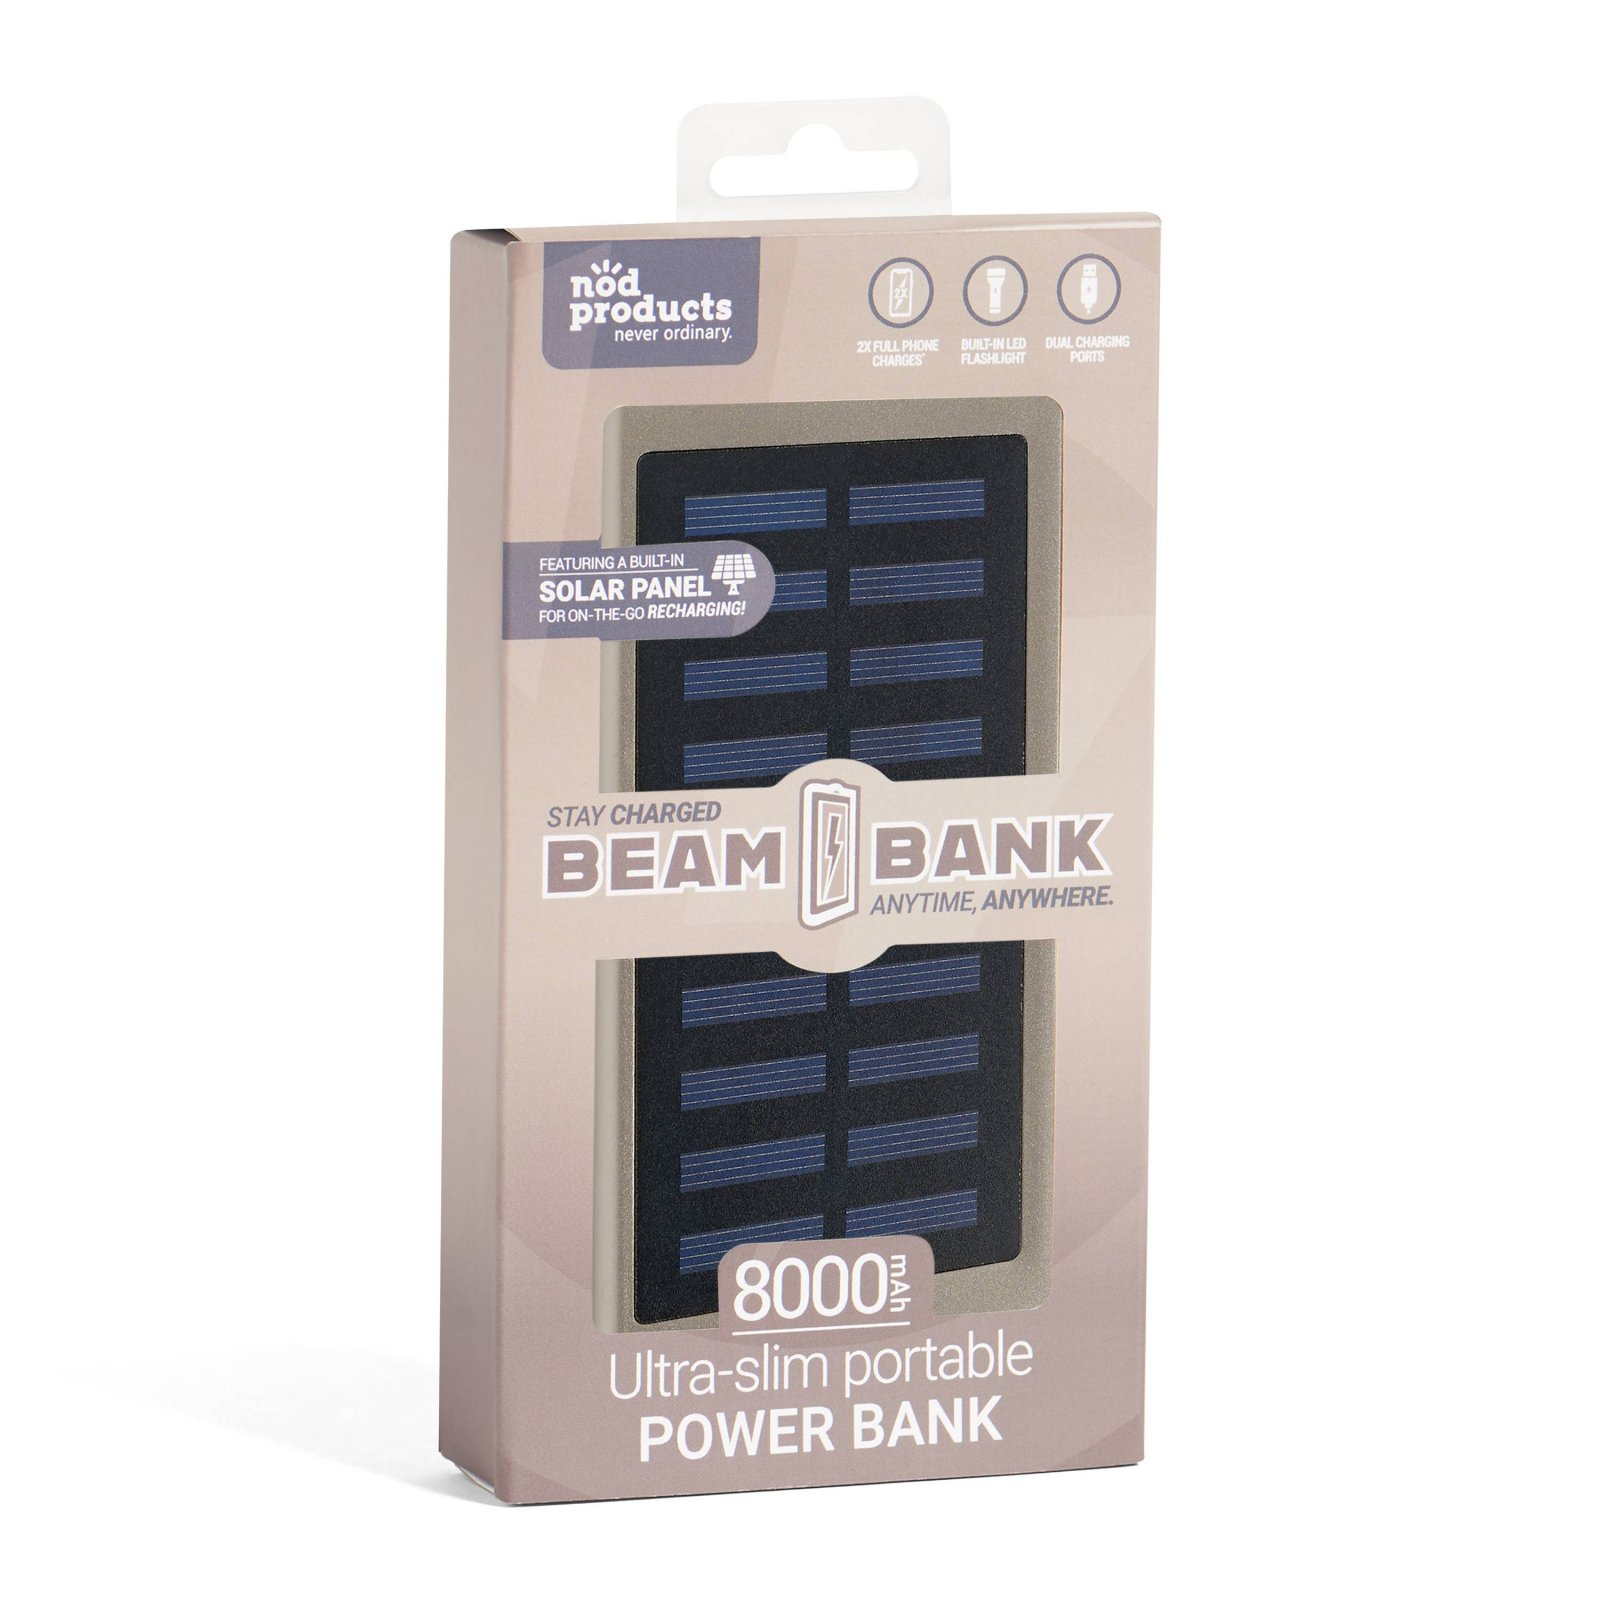 Nod Products Beam Bank